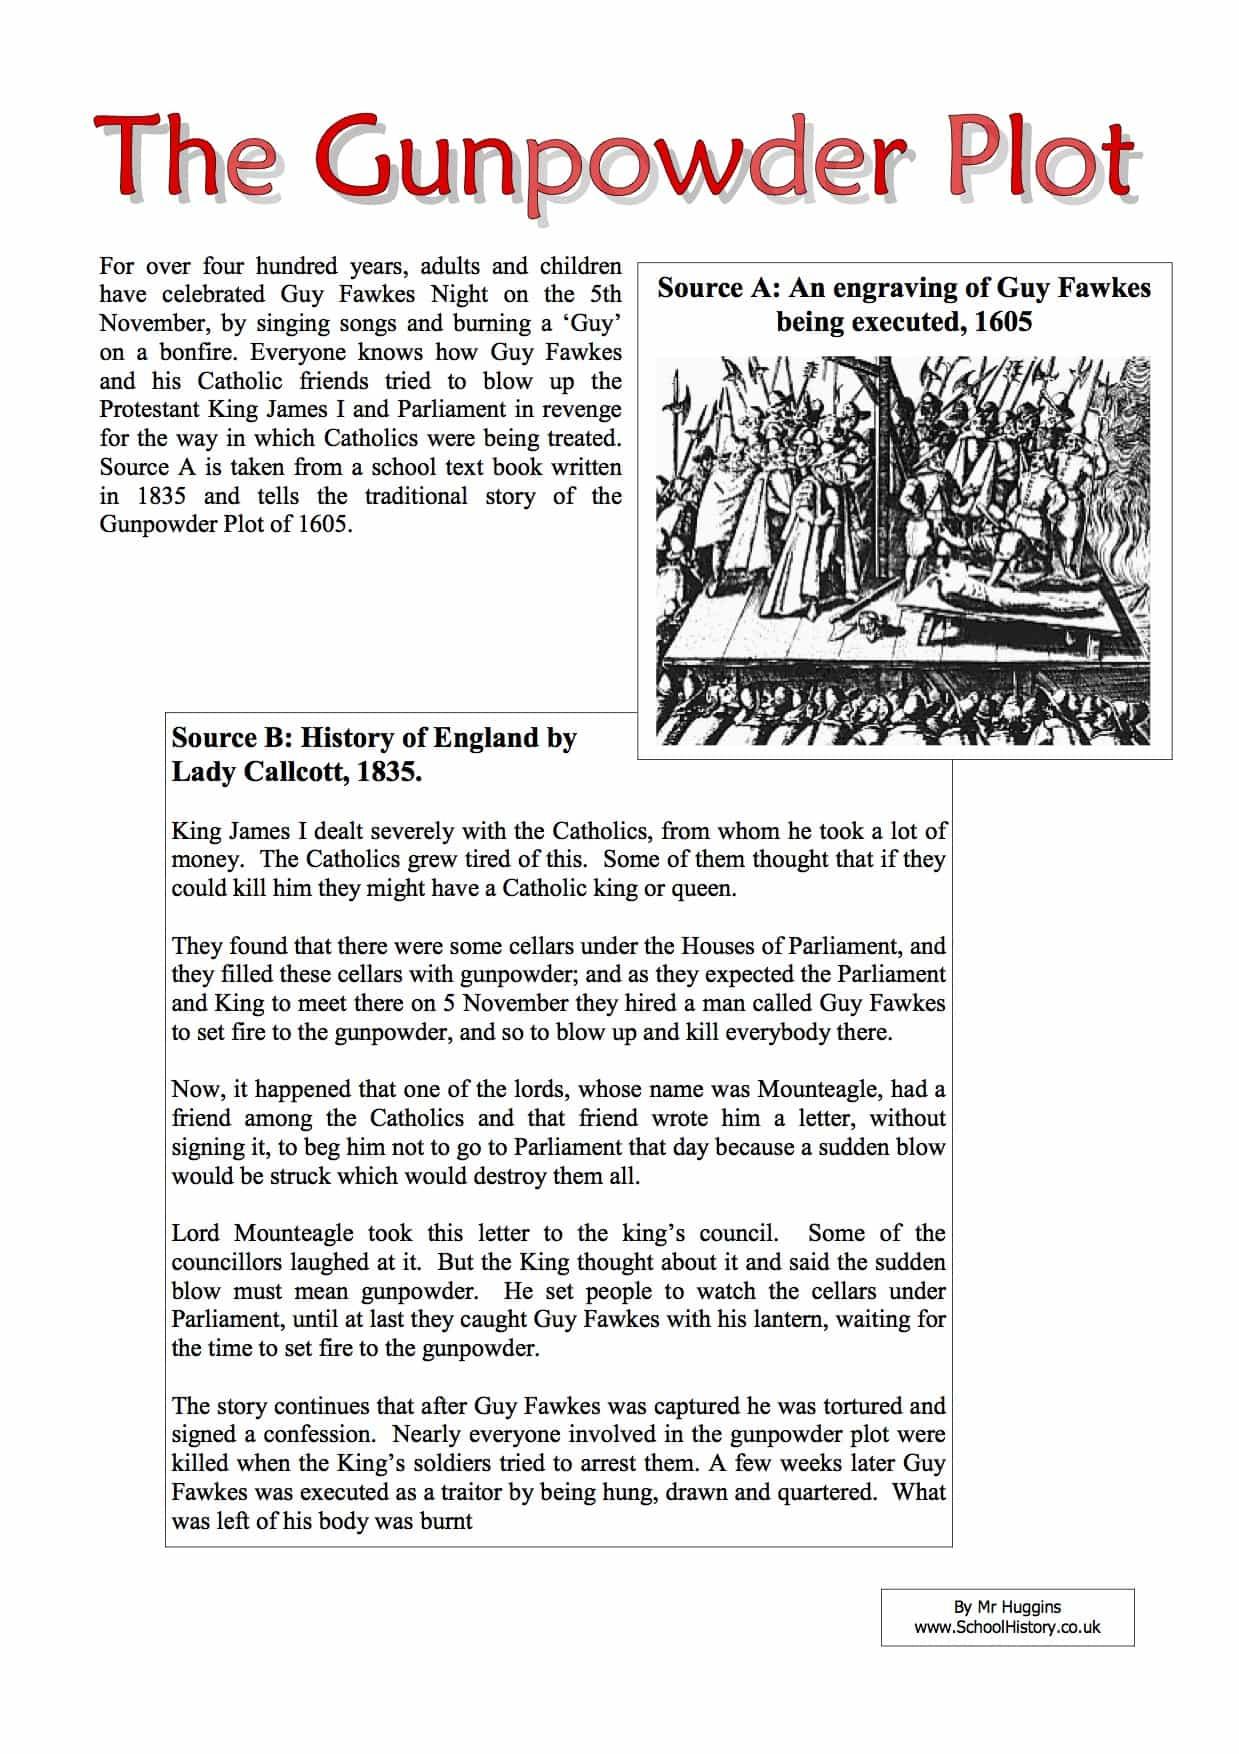 The Gunpowder Plot Facts Worksheet